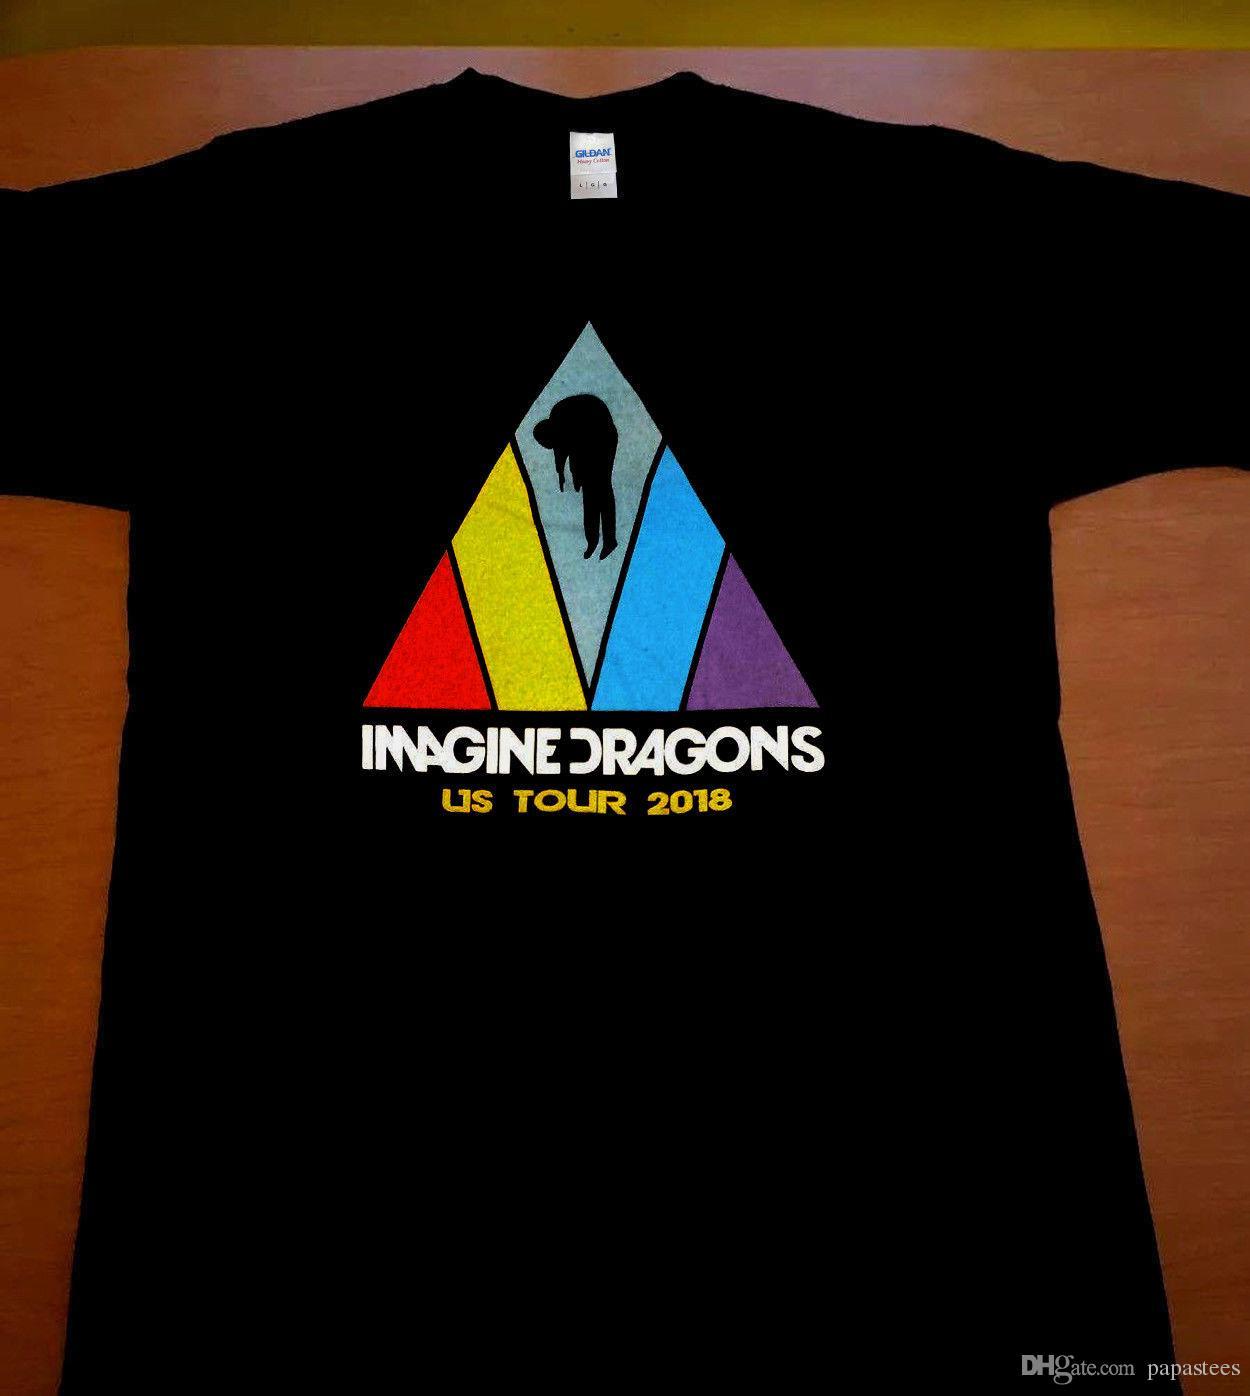 Imagine dragons uk tour dates 2020